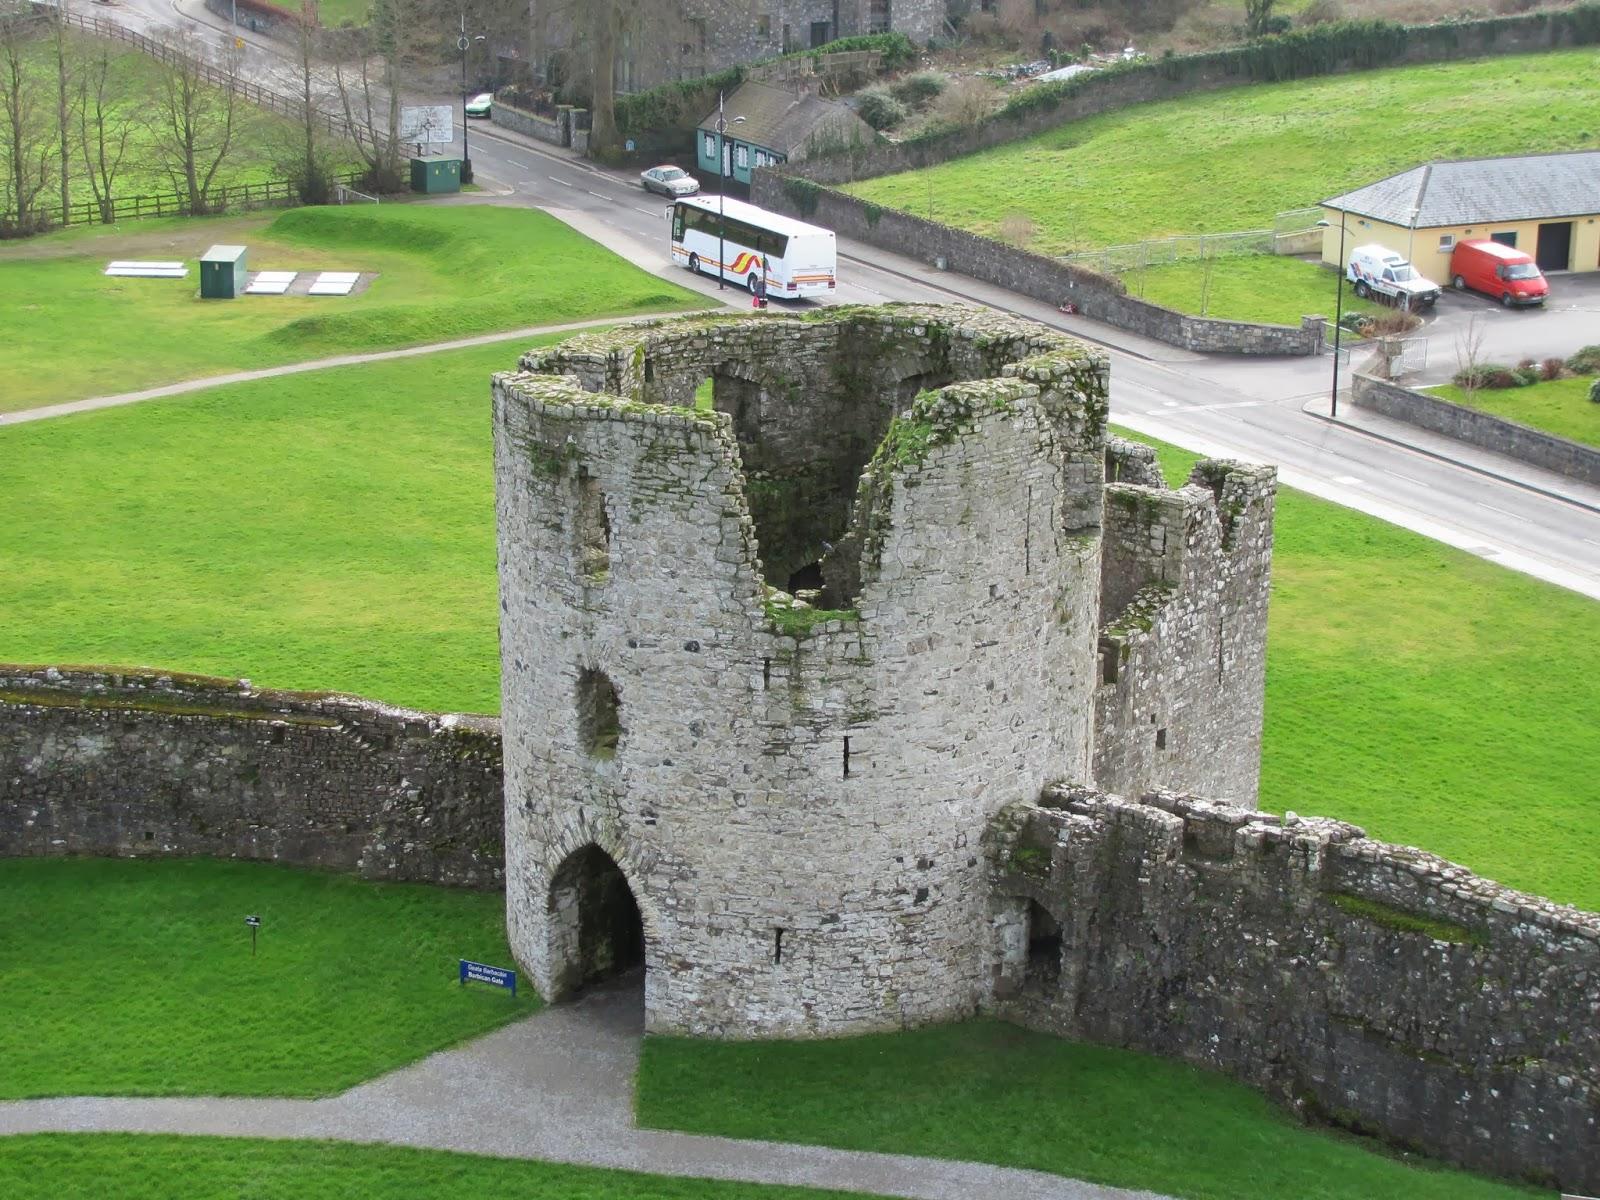 Barbican Gate at Trim Castle, Trim, Ireland